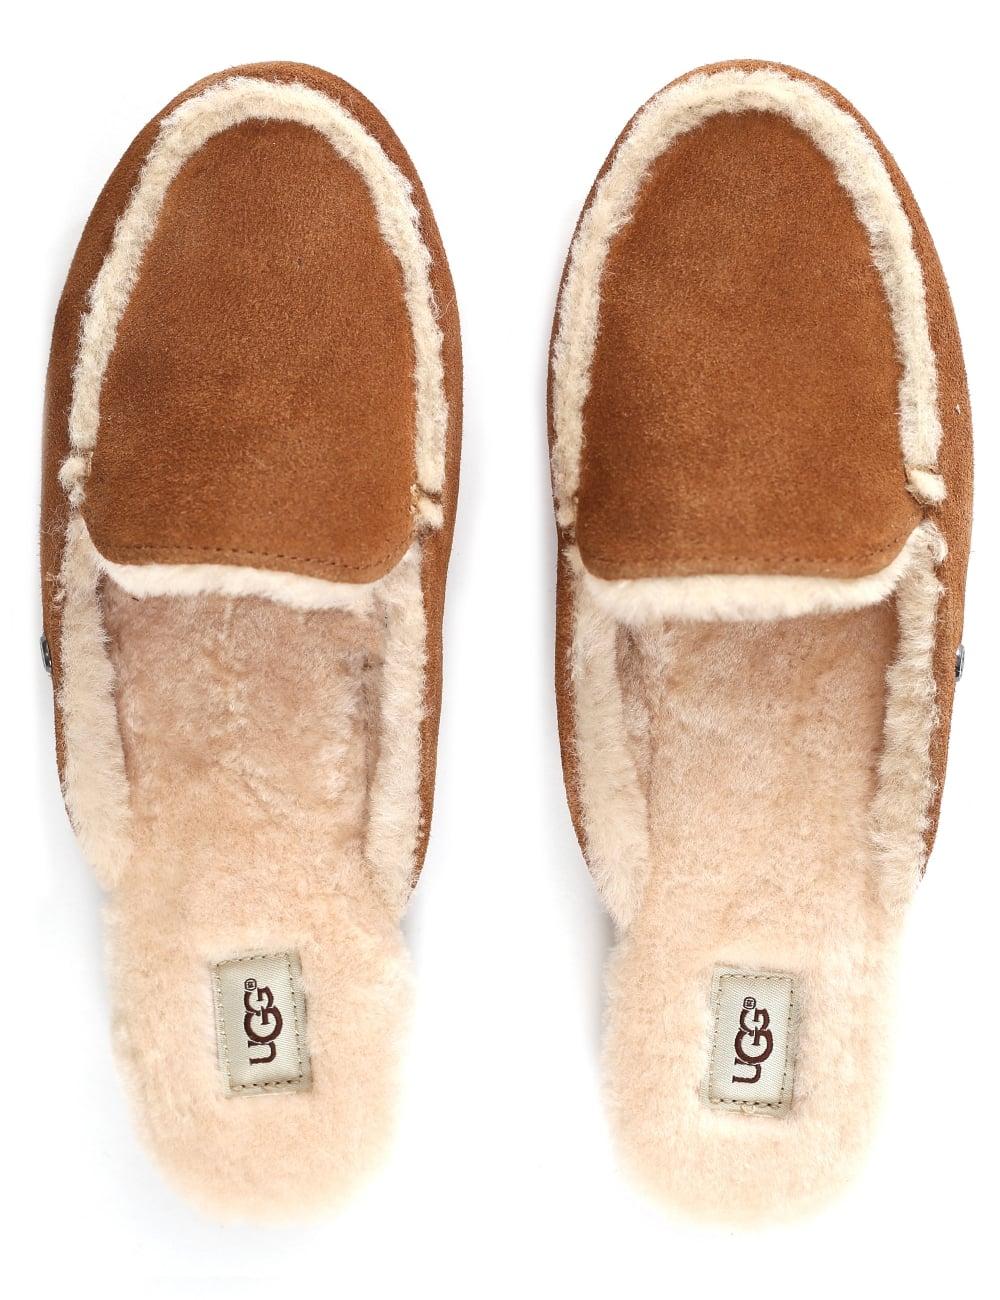 745a396700 UGG Women s Lane Slip-On Loafer